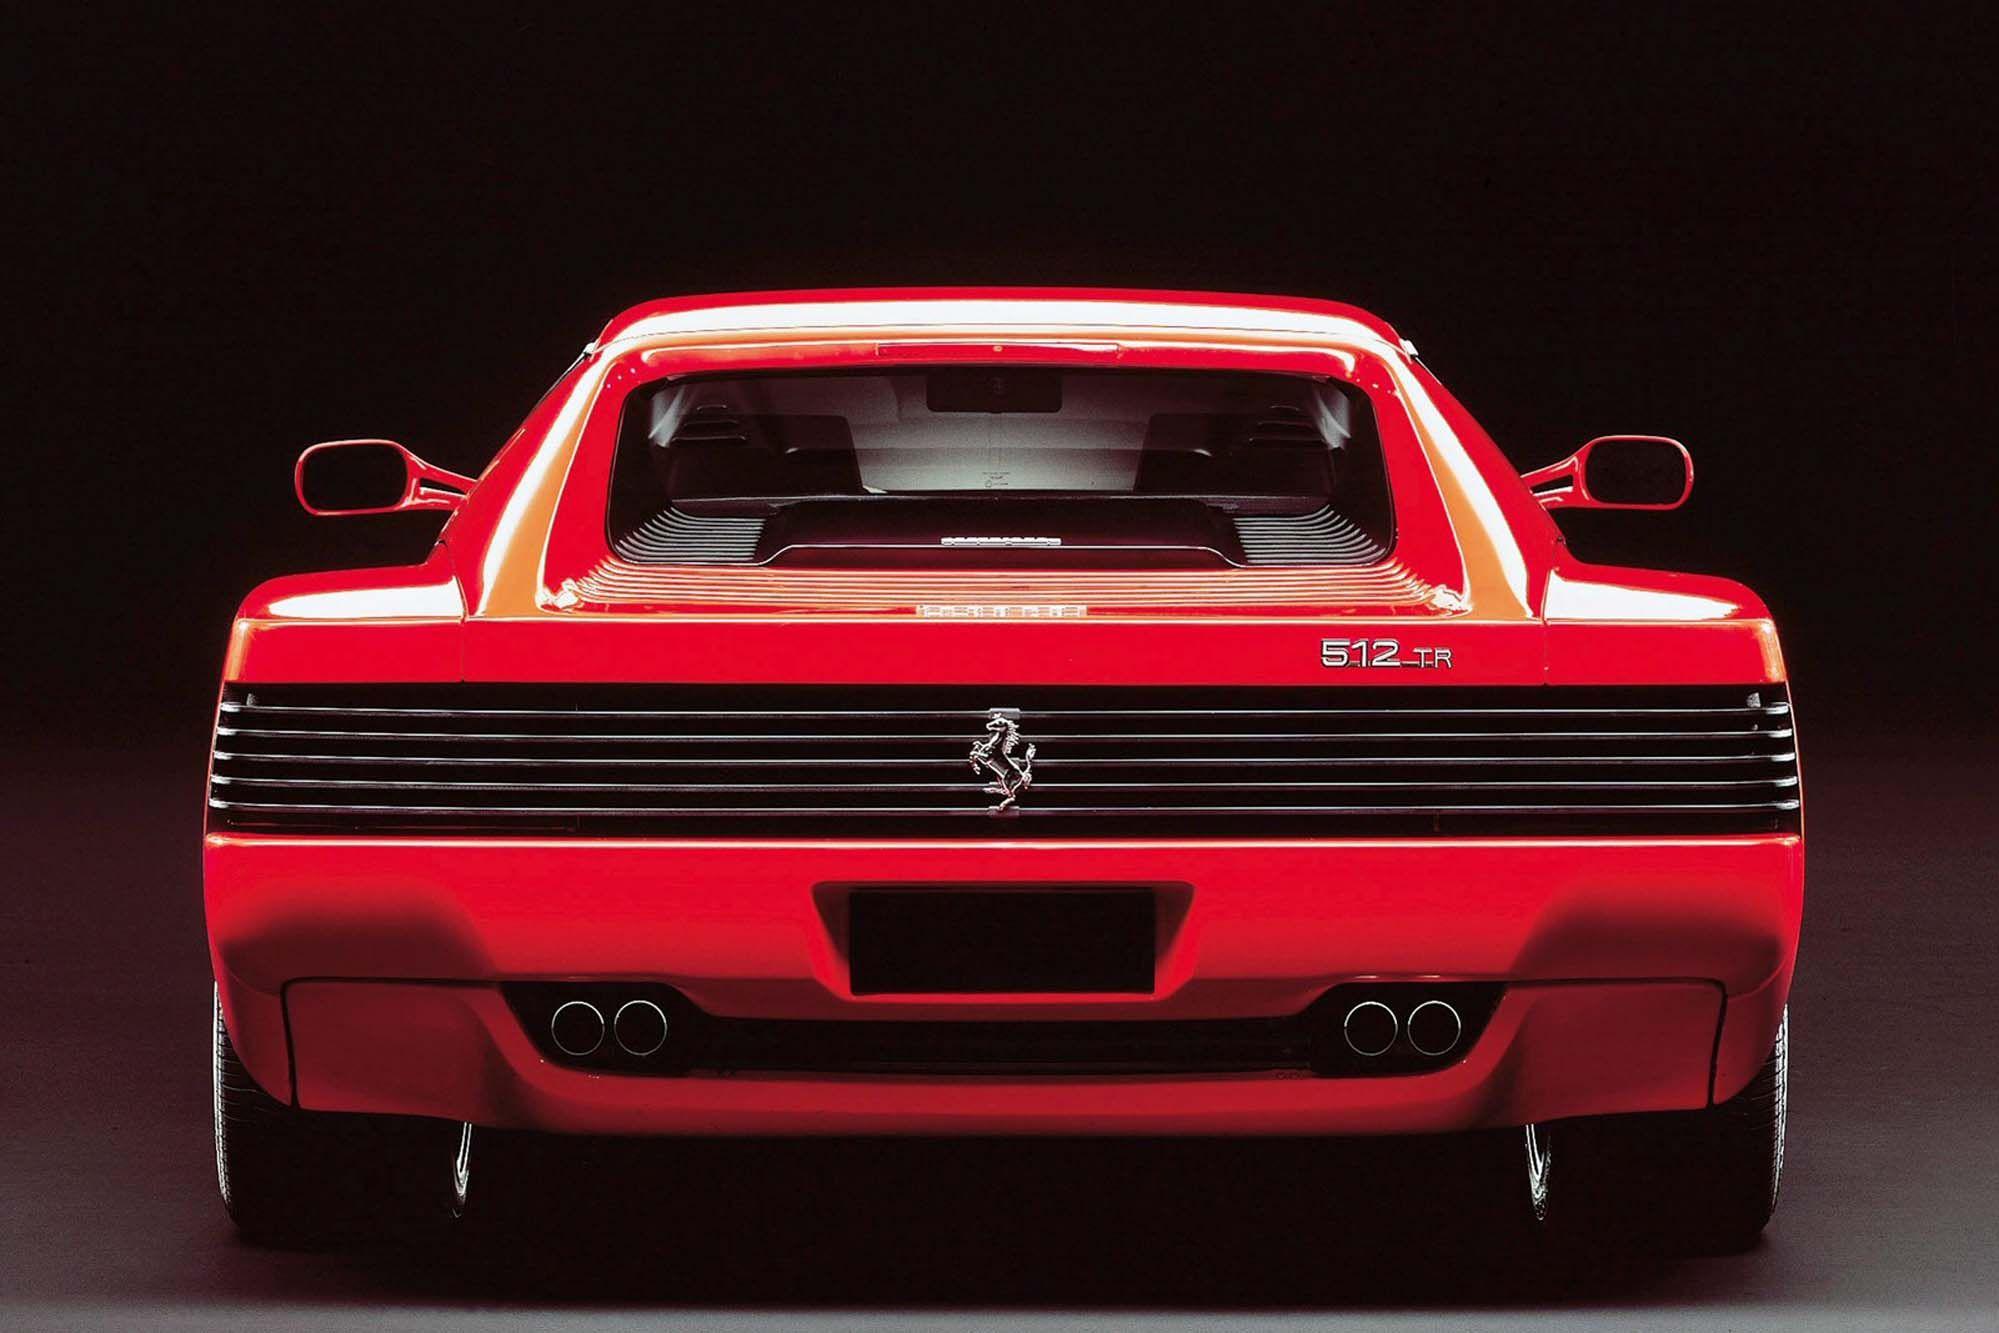 Ferrari testarossa car wallpapers hd 1080p httphdcarwallfx ferrari testarossa car wallpapers hd 1080p httphdcarwallfxferrari vanachro Image collections